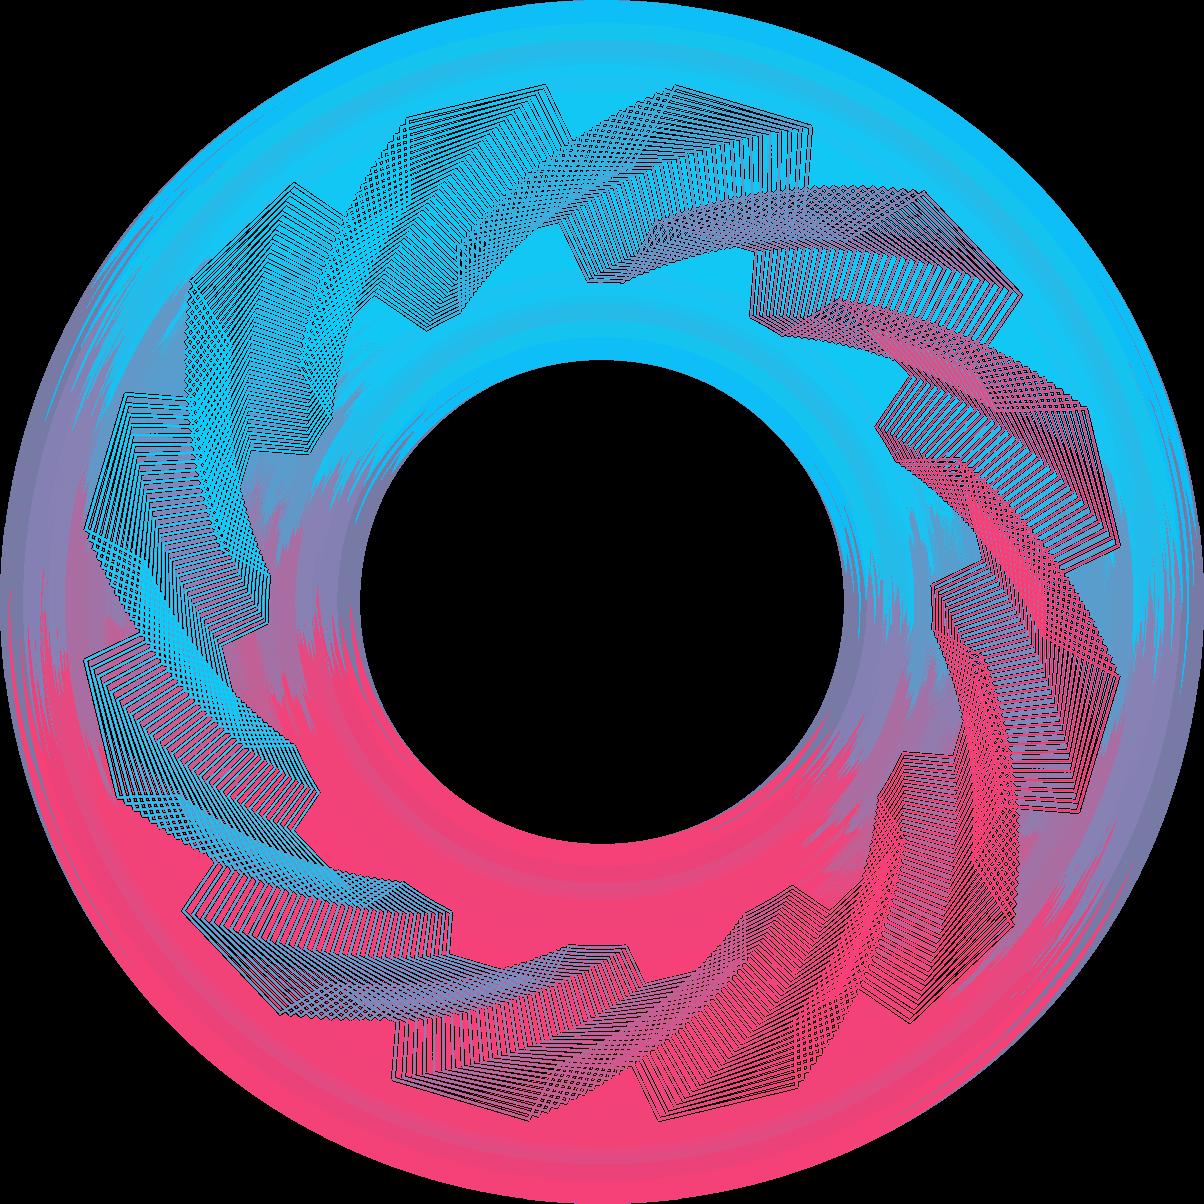 Zigzag vortex design